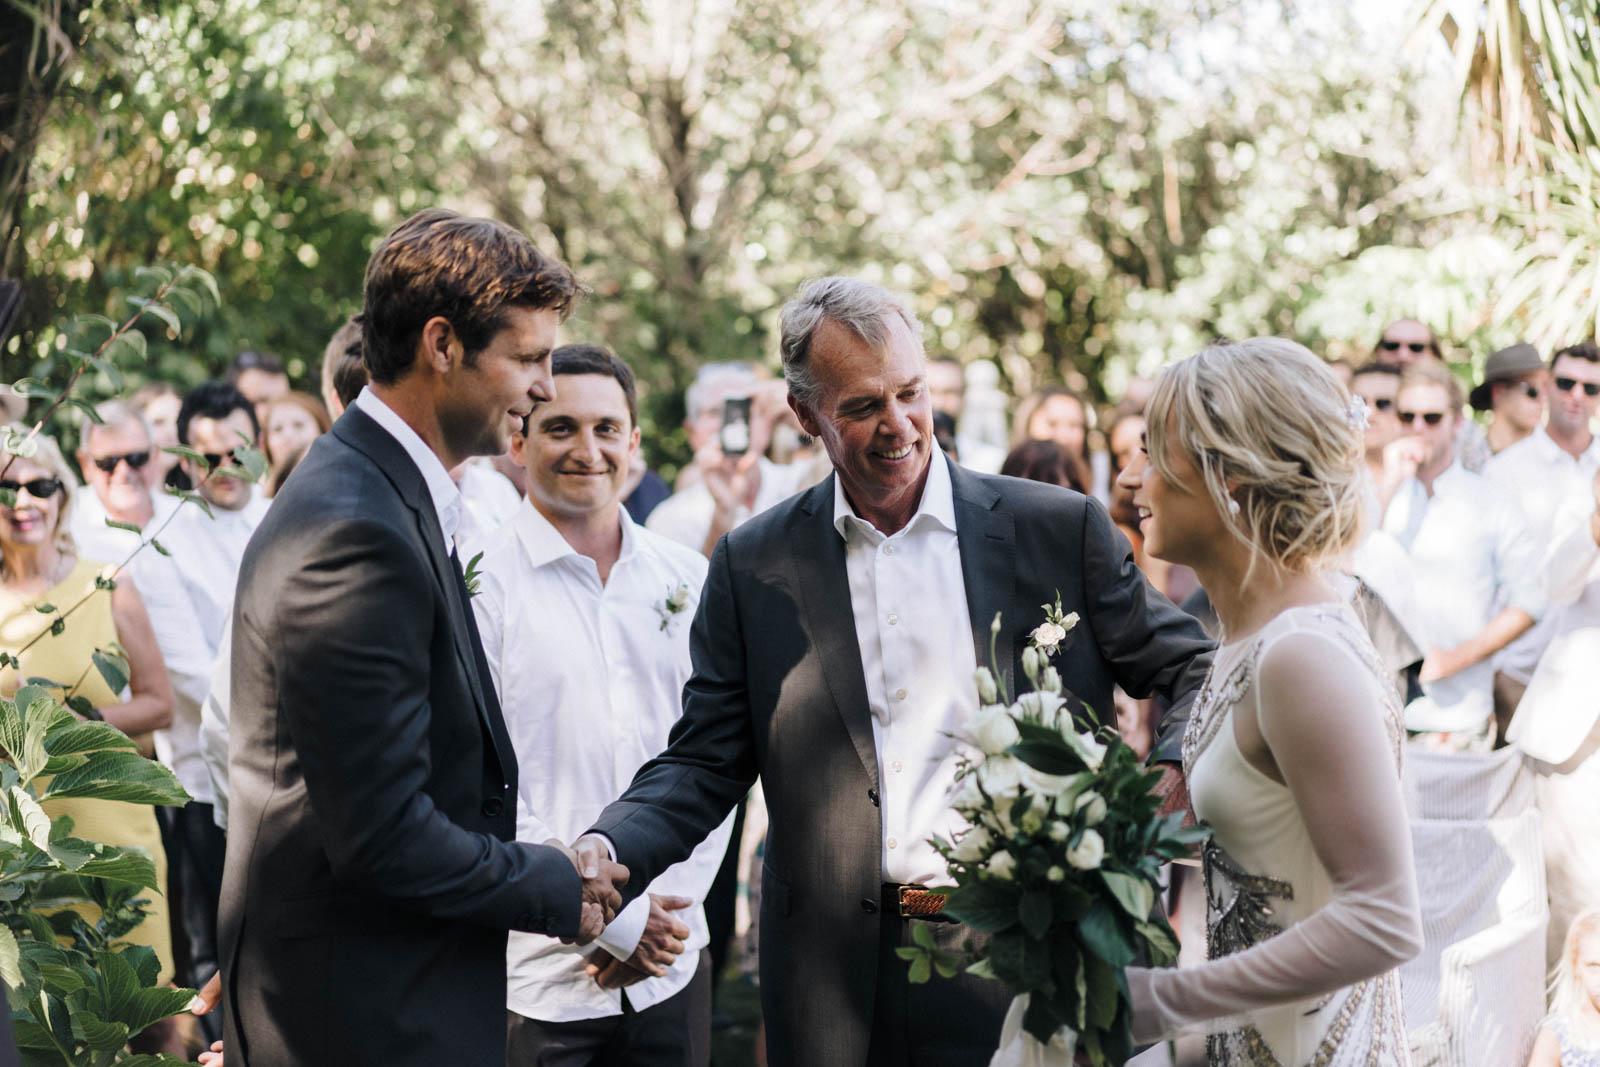 newfound-l-i-coromandel-wedding-photographer-1609-A9_02895